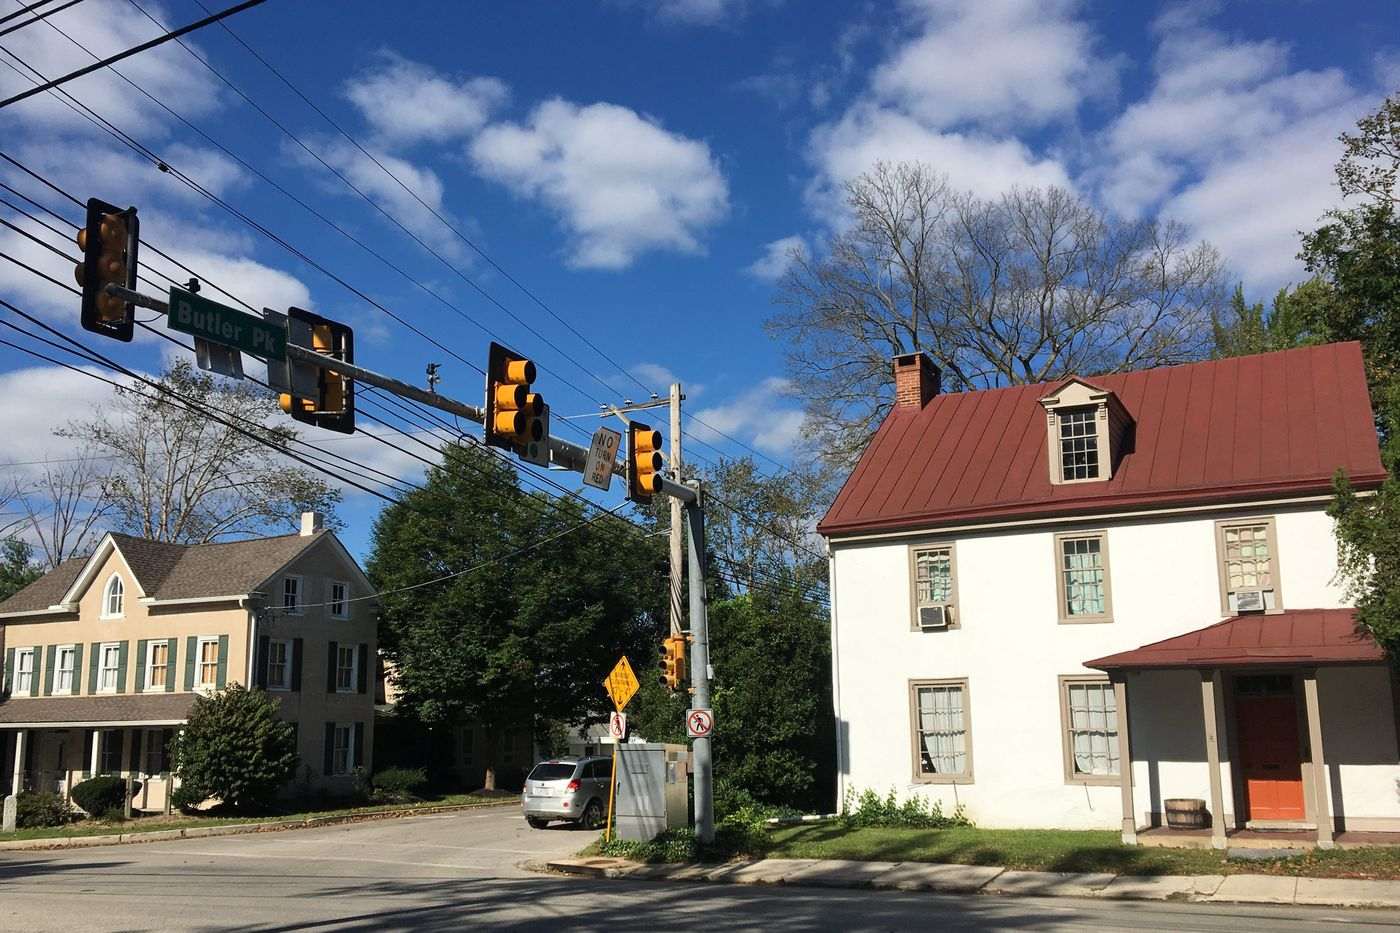 Pennsylvania's antislavery history is under threat from suburban development | Inga Saffron